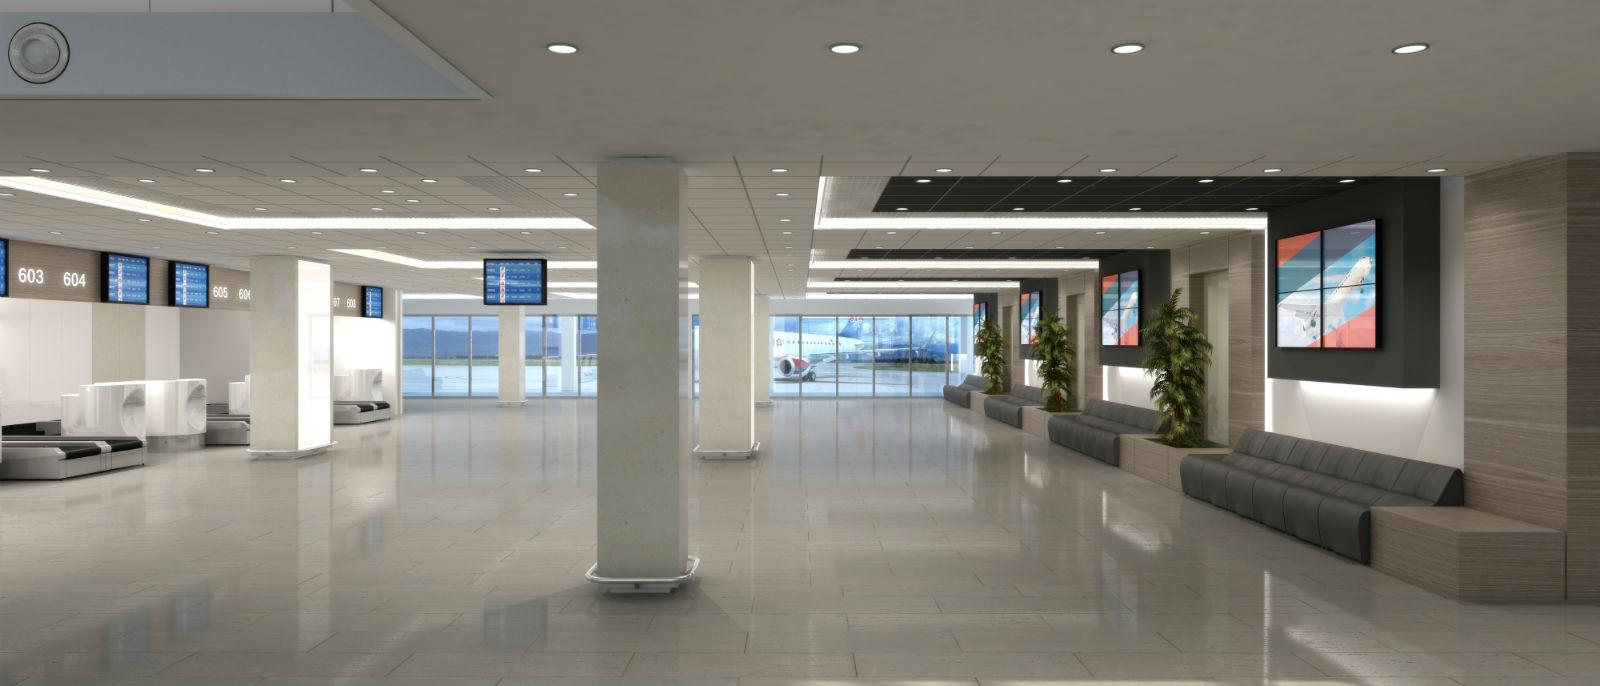 Buduci izgled Terminala 1